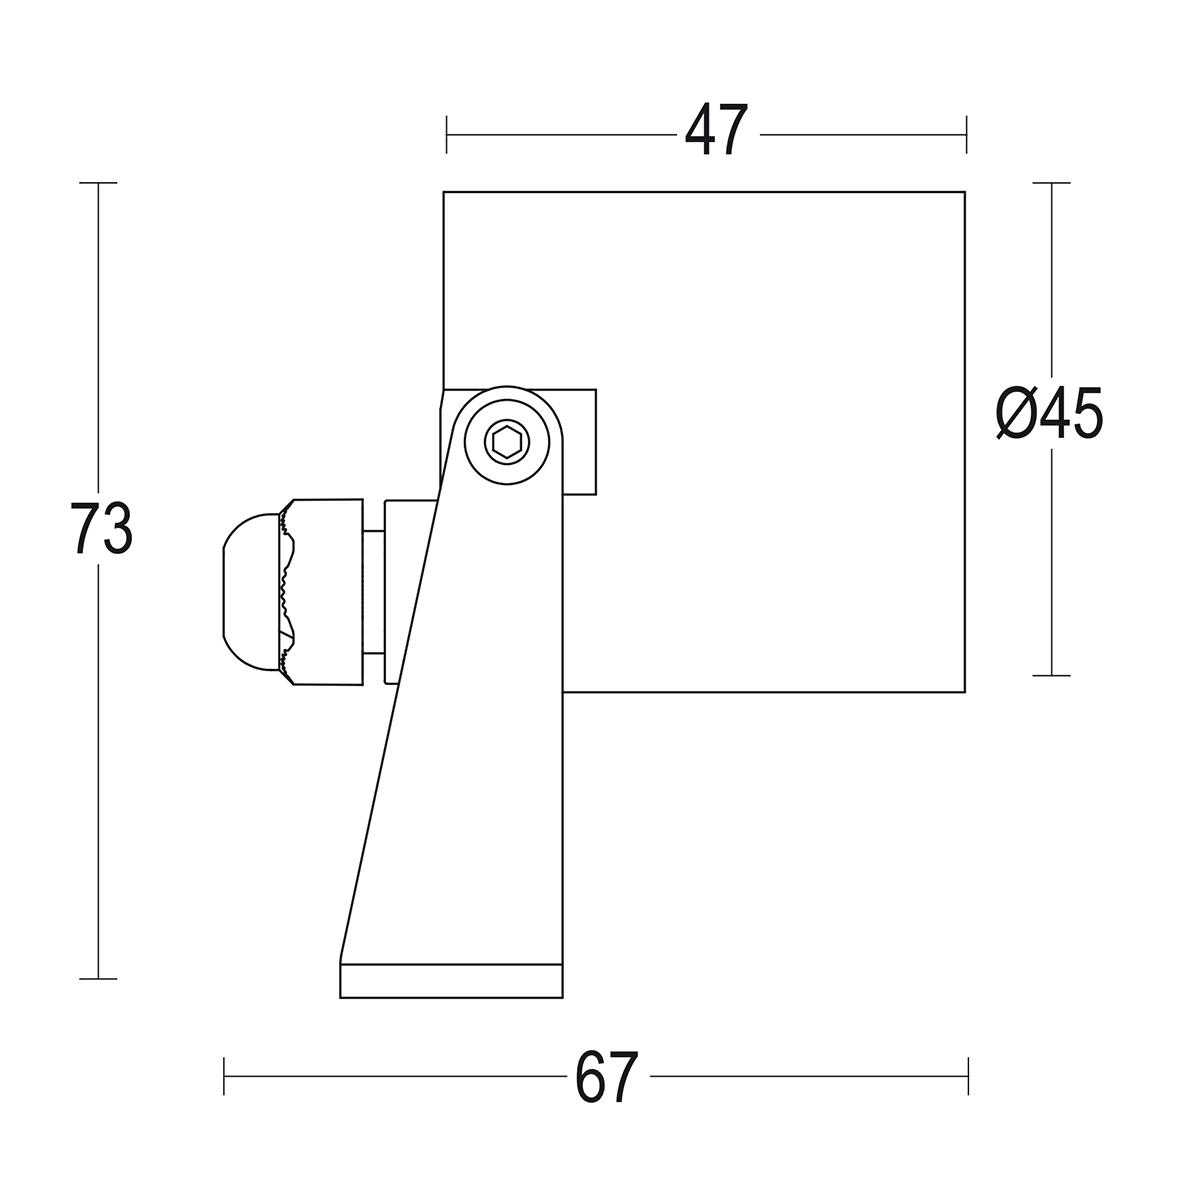 чертеж Maxisegno Spot S Steel 45 Ghidini уличный светильник GH1172.BAST300EC